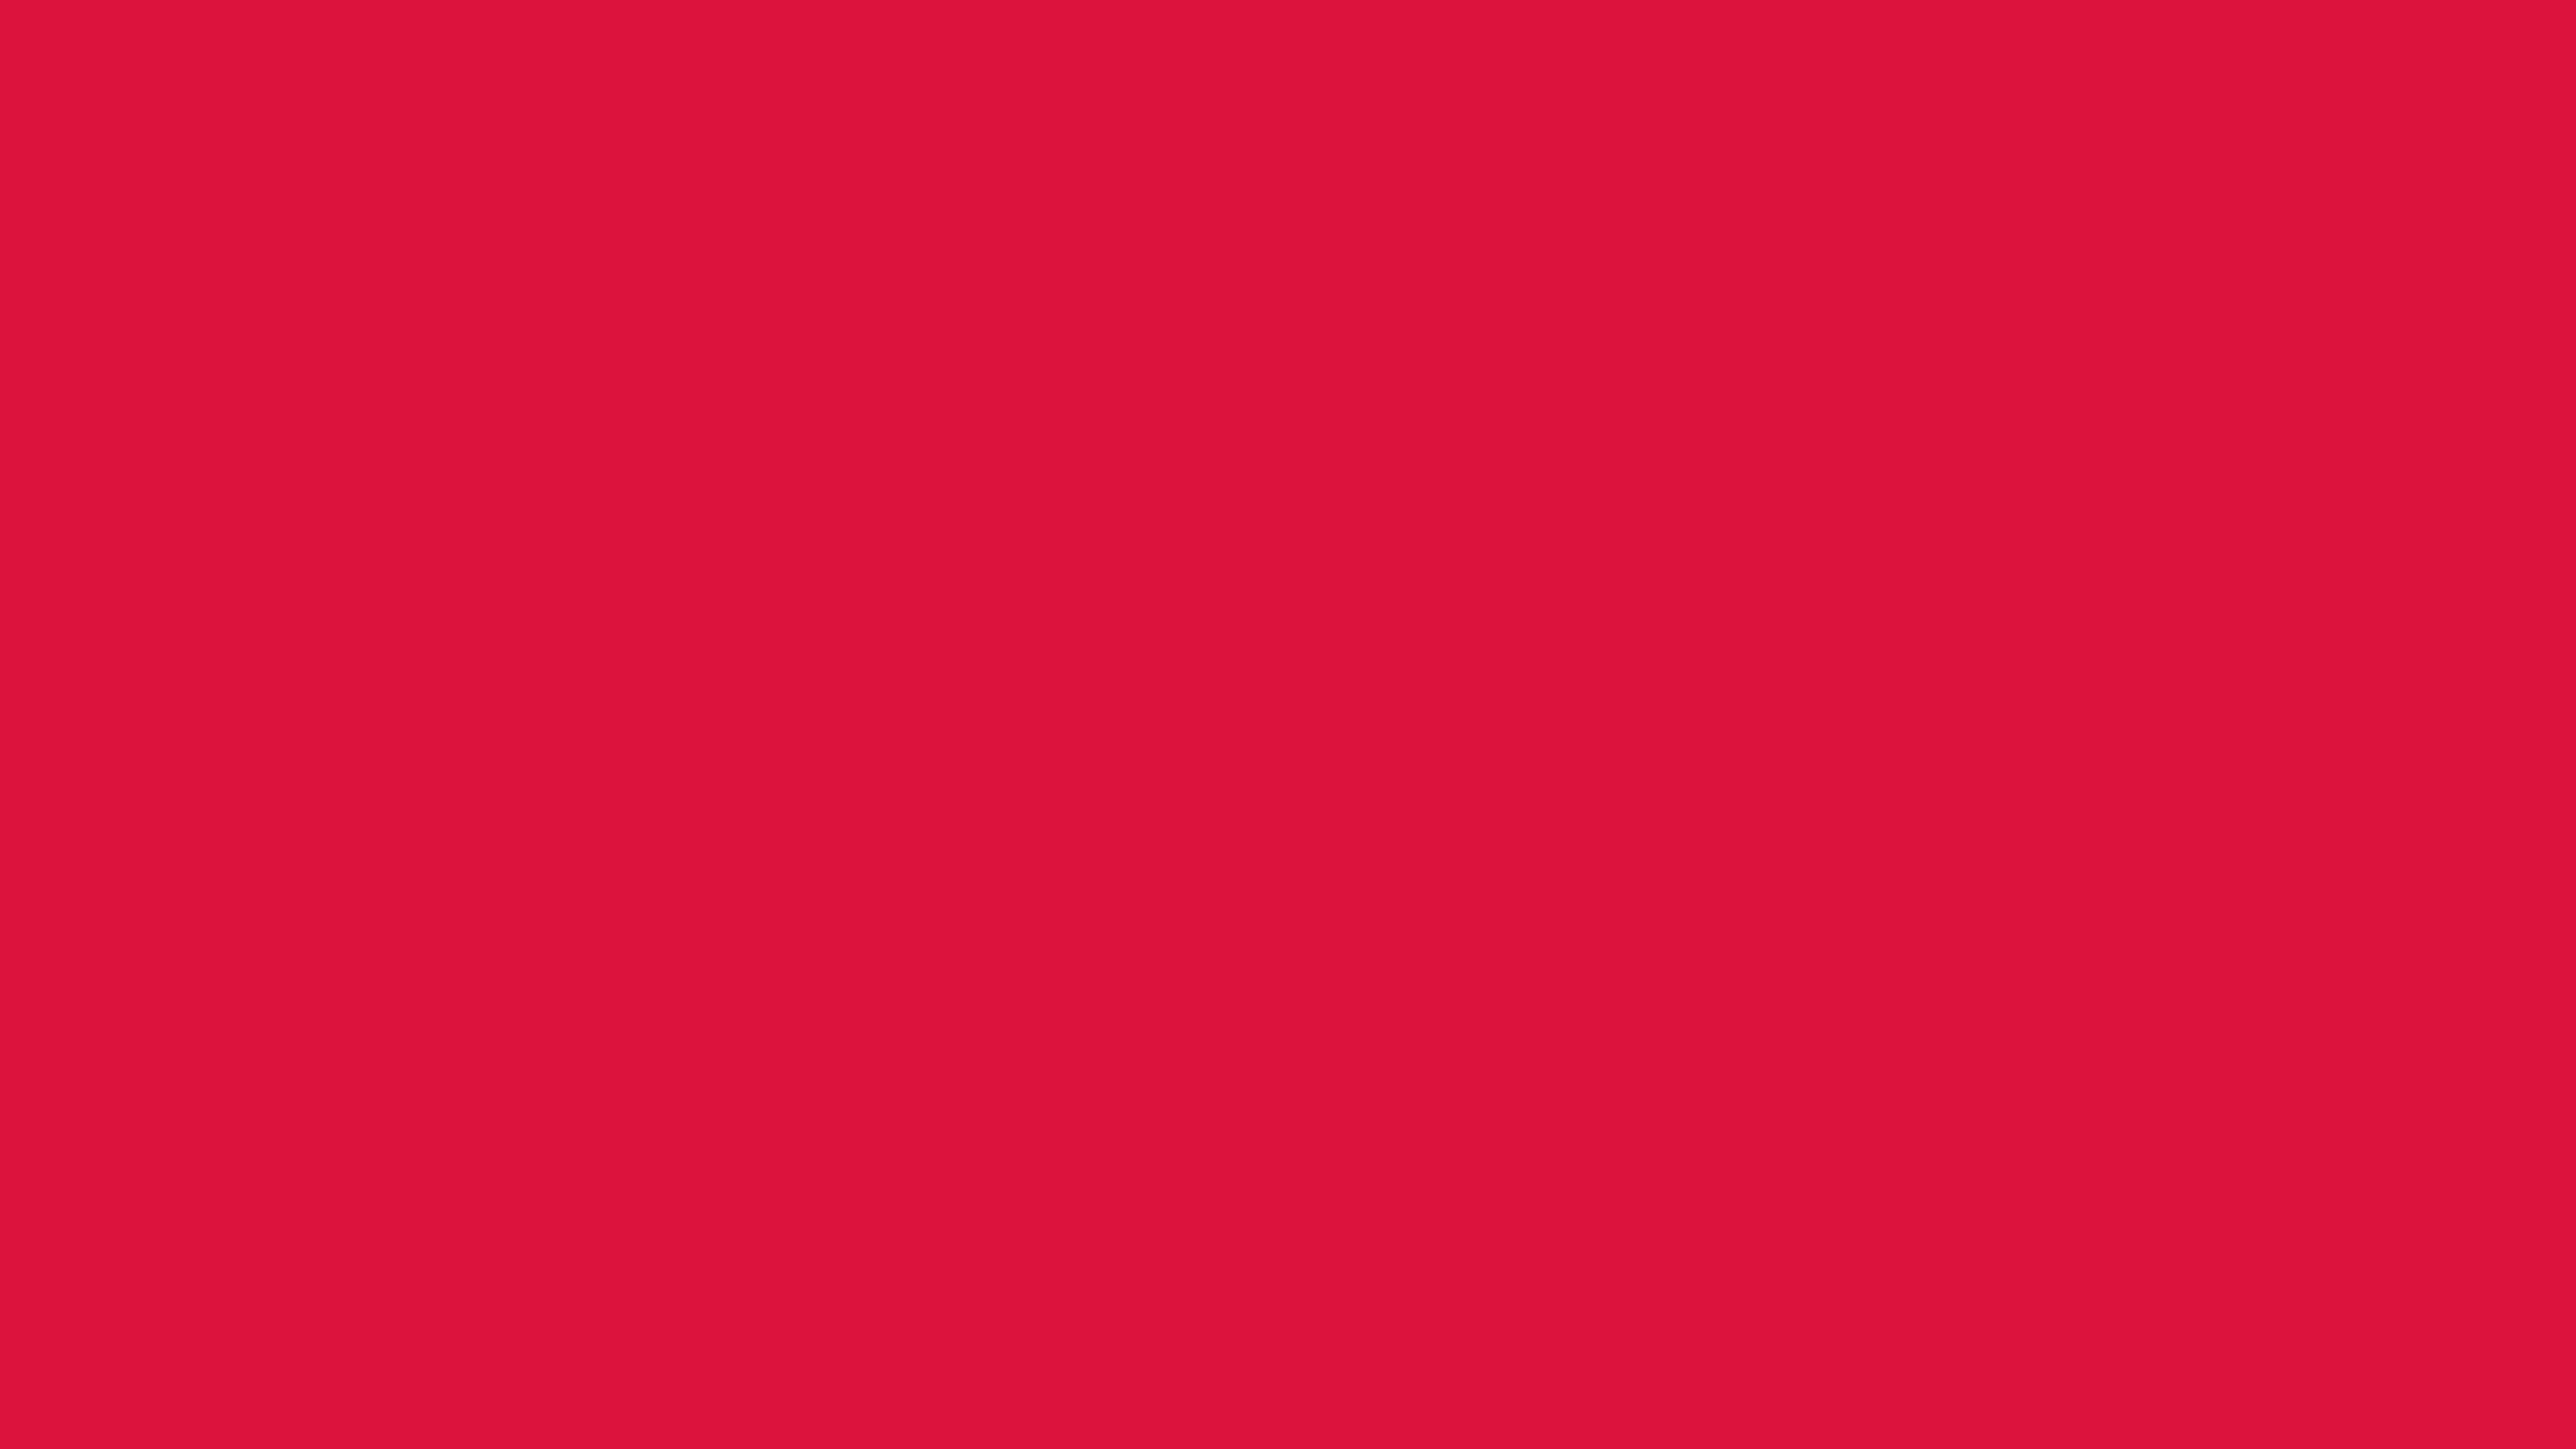 7680x4320 Crimson Solid Color Background